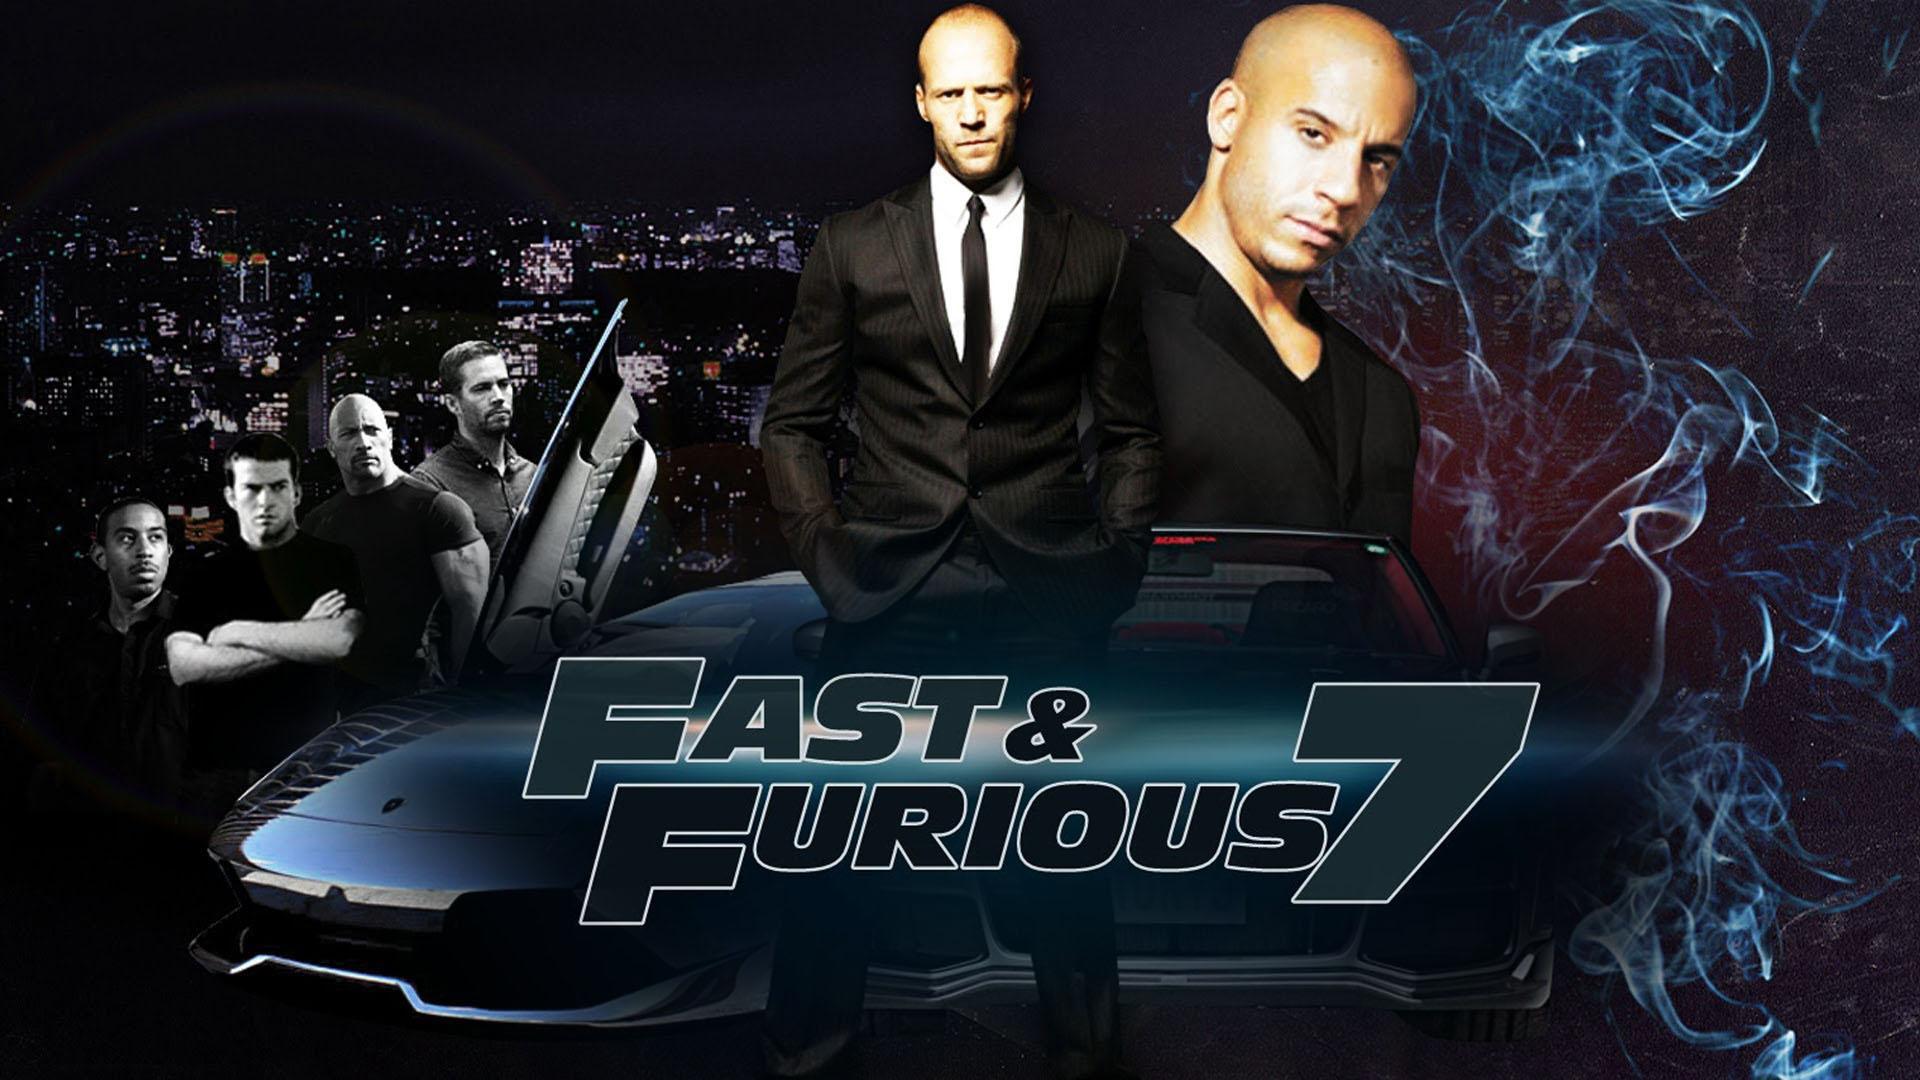 Fast And Furious 7 Cars 21591 Wallpaper High Resolution Wallarthd 1920x1080